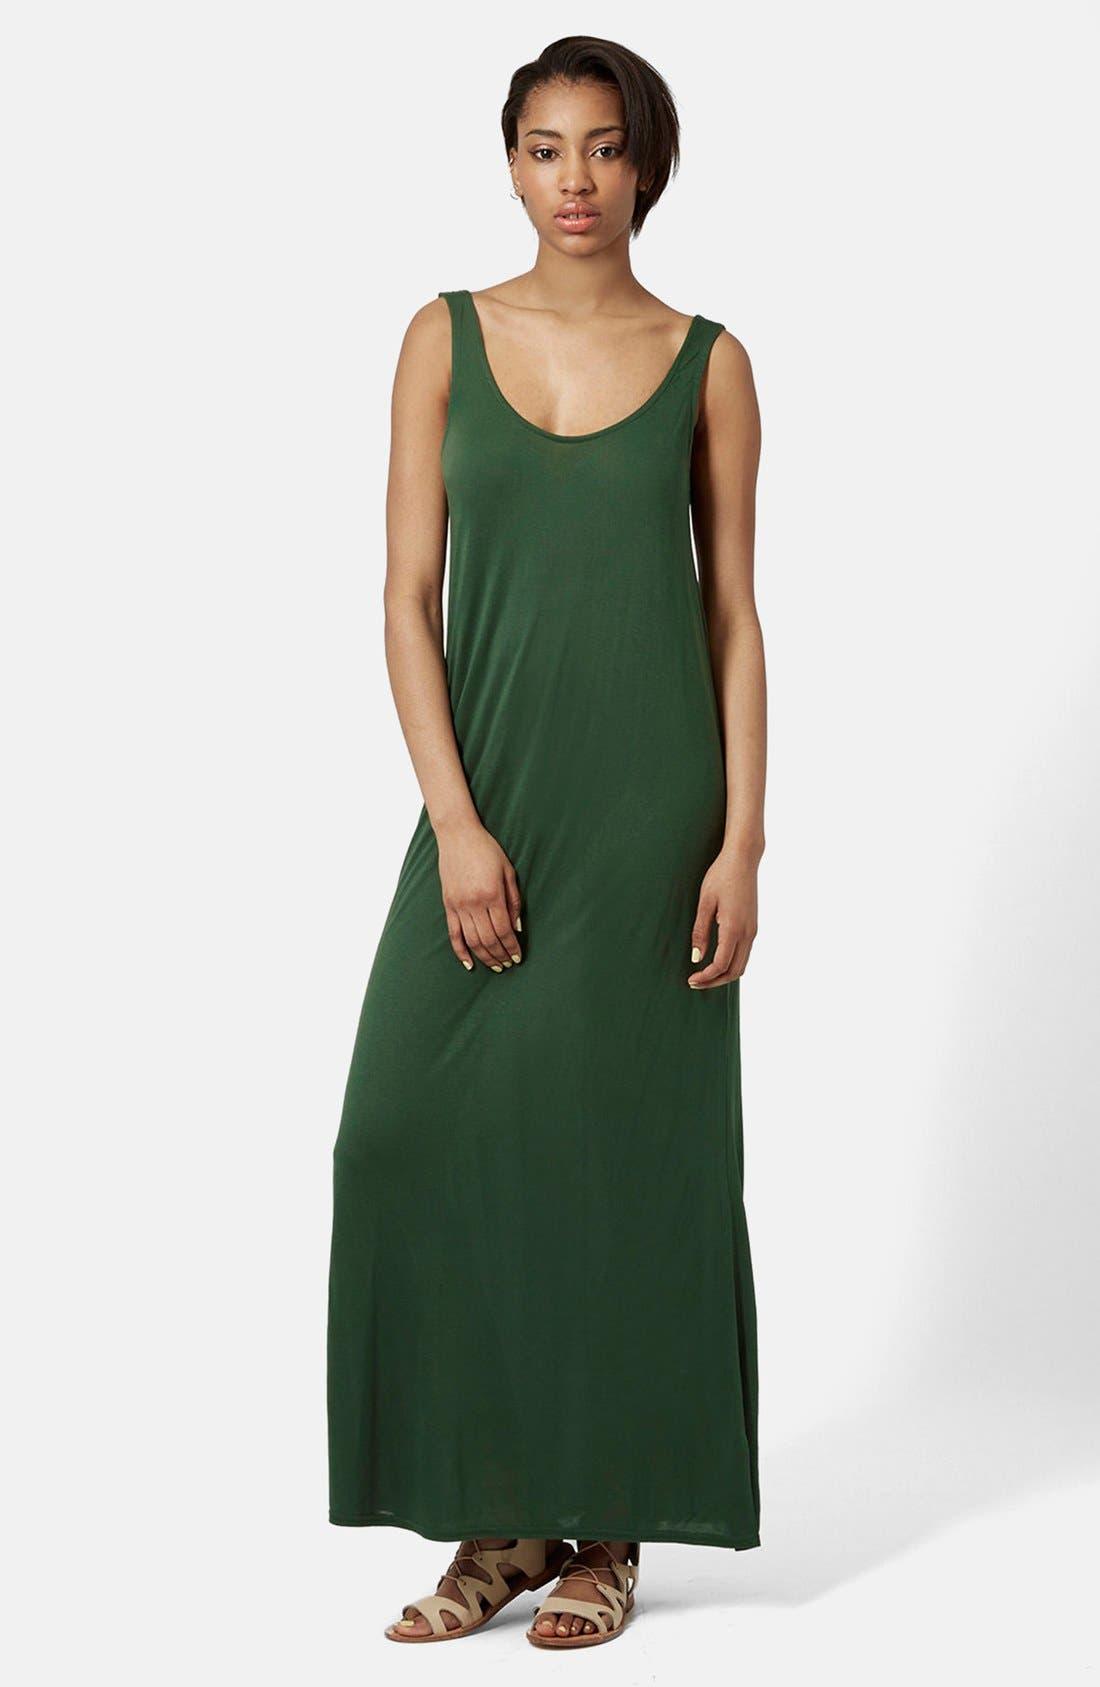 Alternate Image 1 Selected - Topshop Knit Tank Maxi Dress